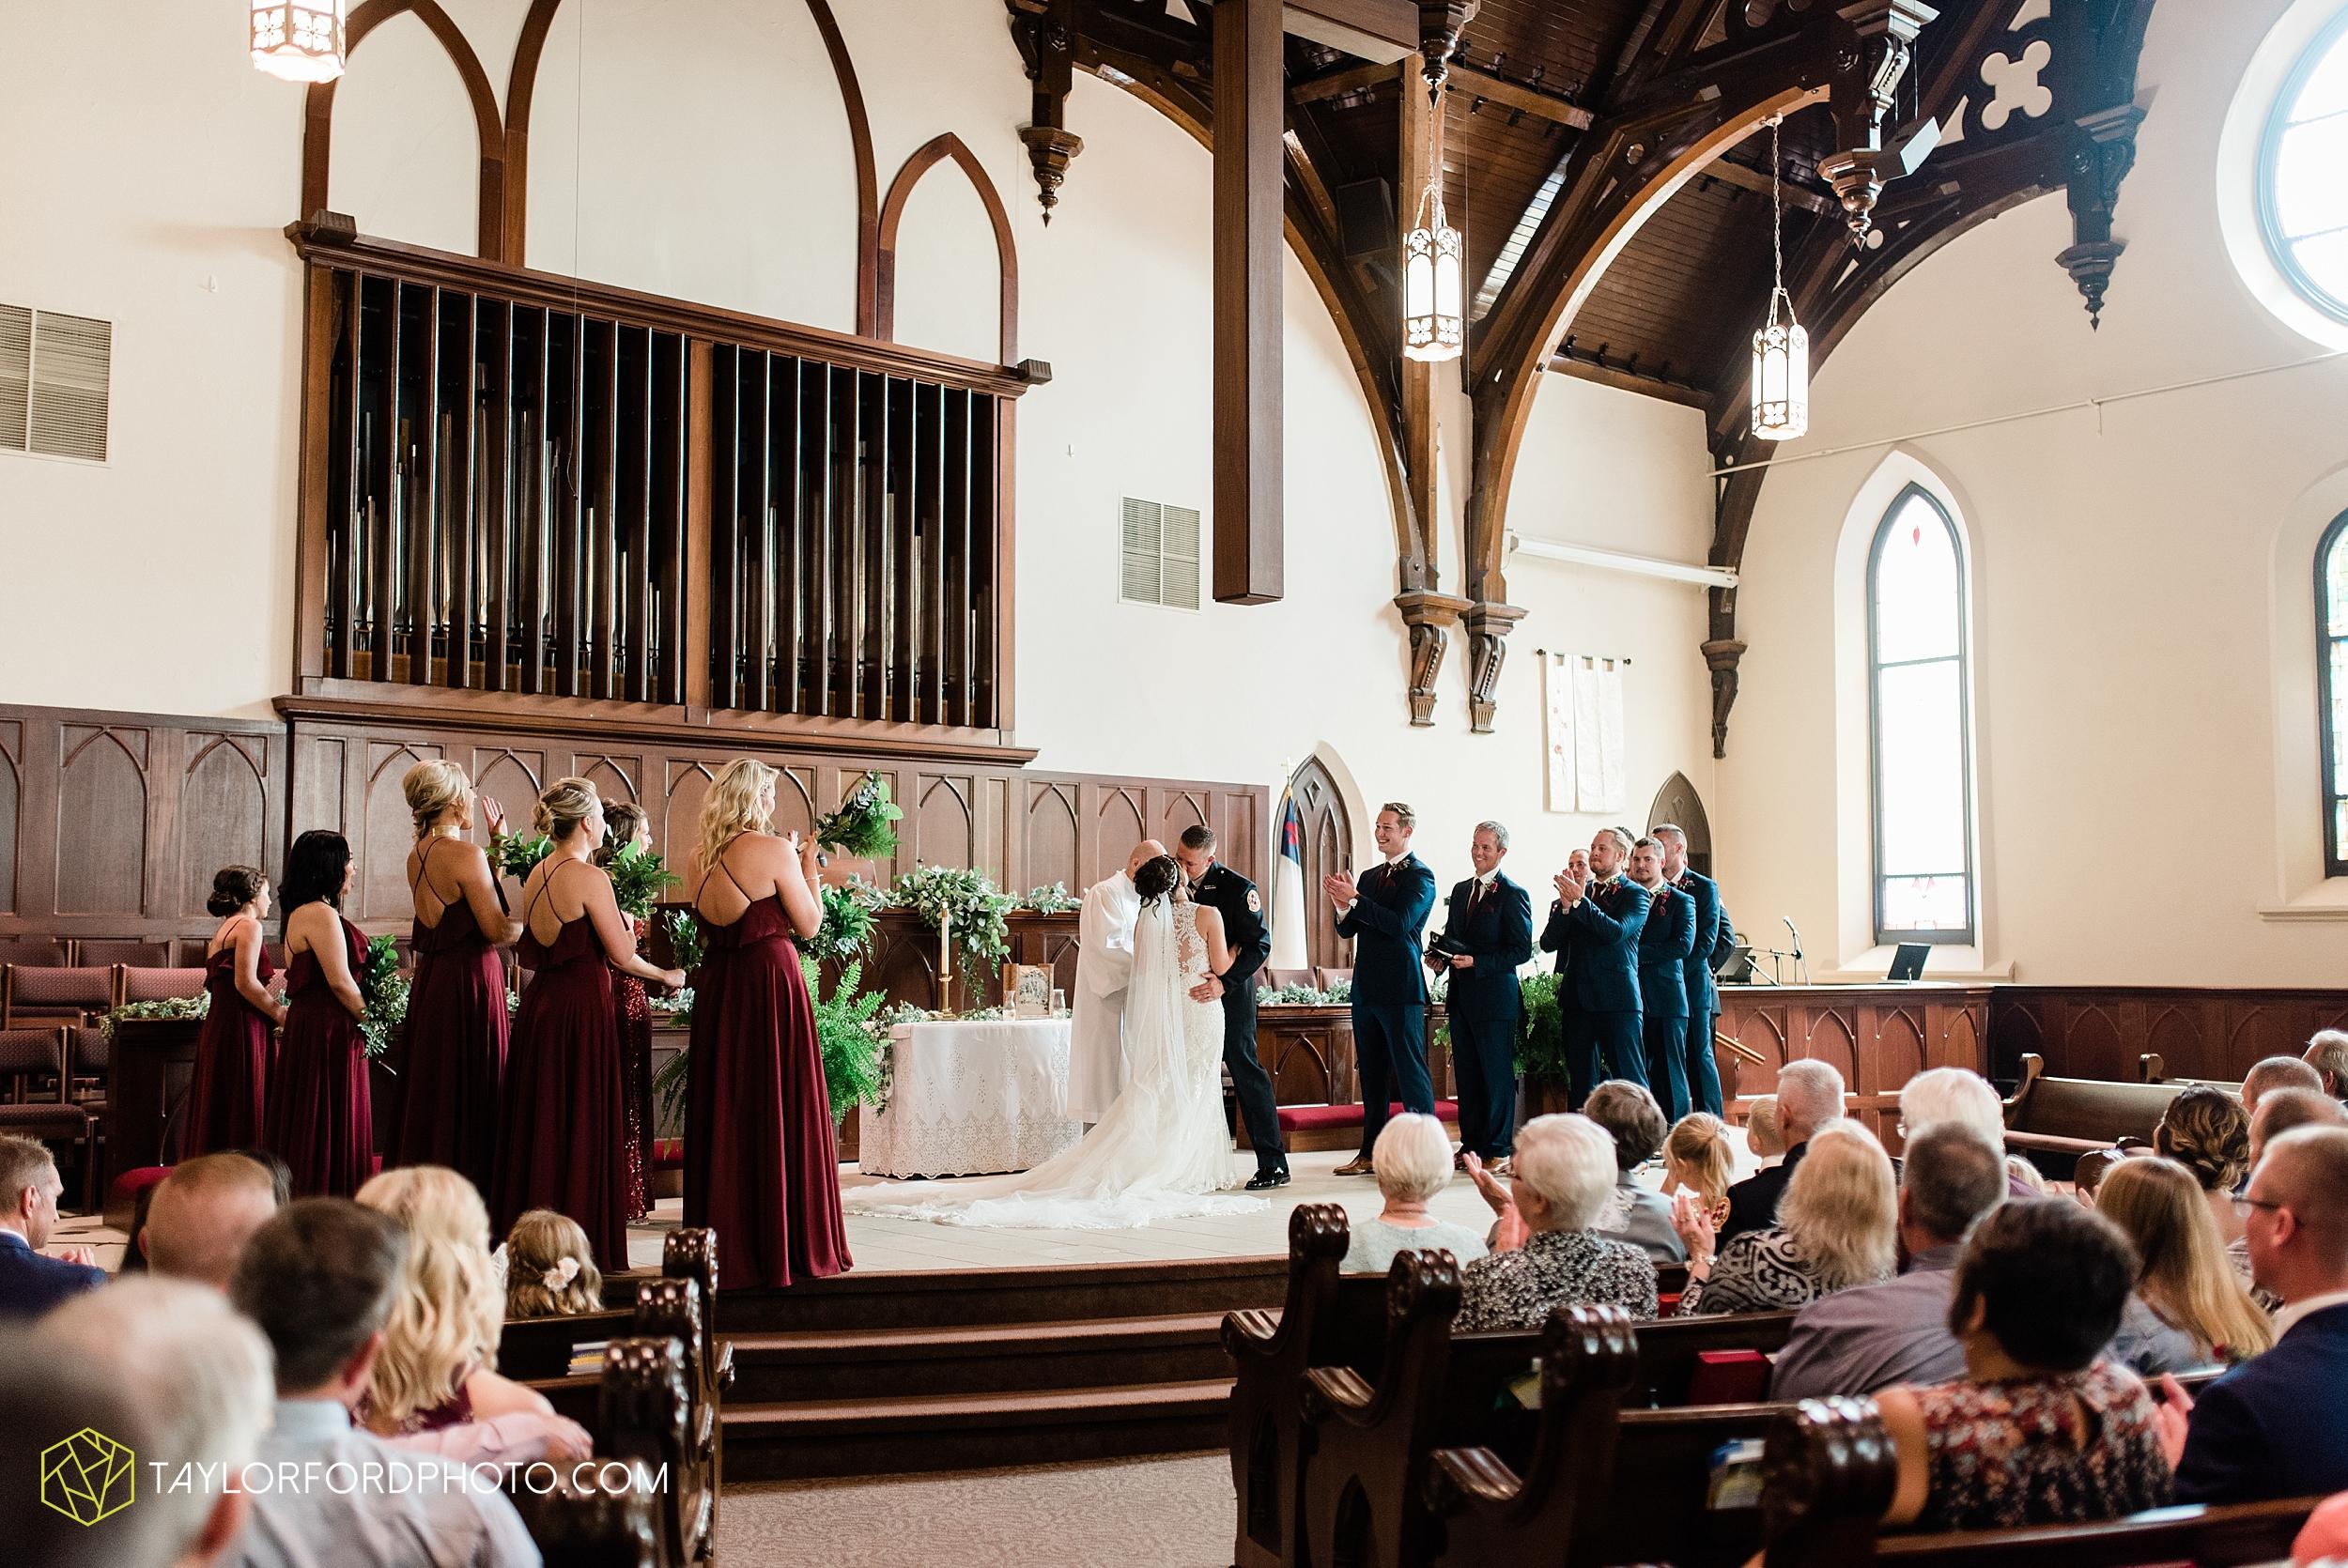 van-wert-ohio-first-united-methodist-church-county-dairy-barn-wedding-photographer-taylor-ford-photography_9834.jpg